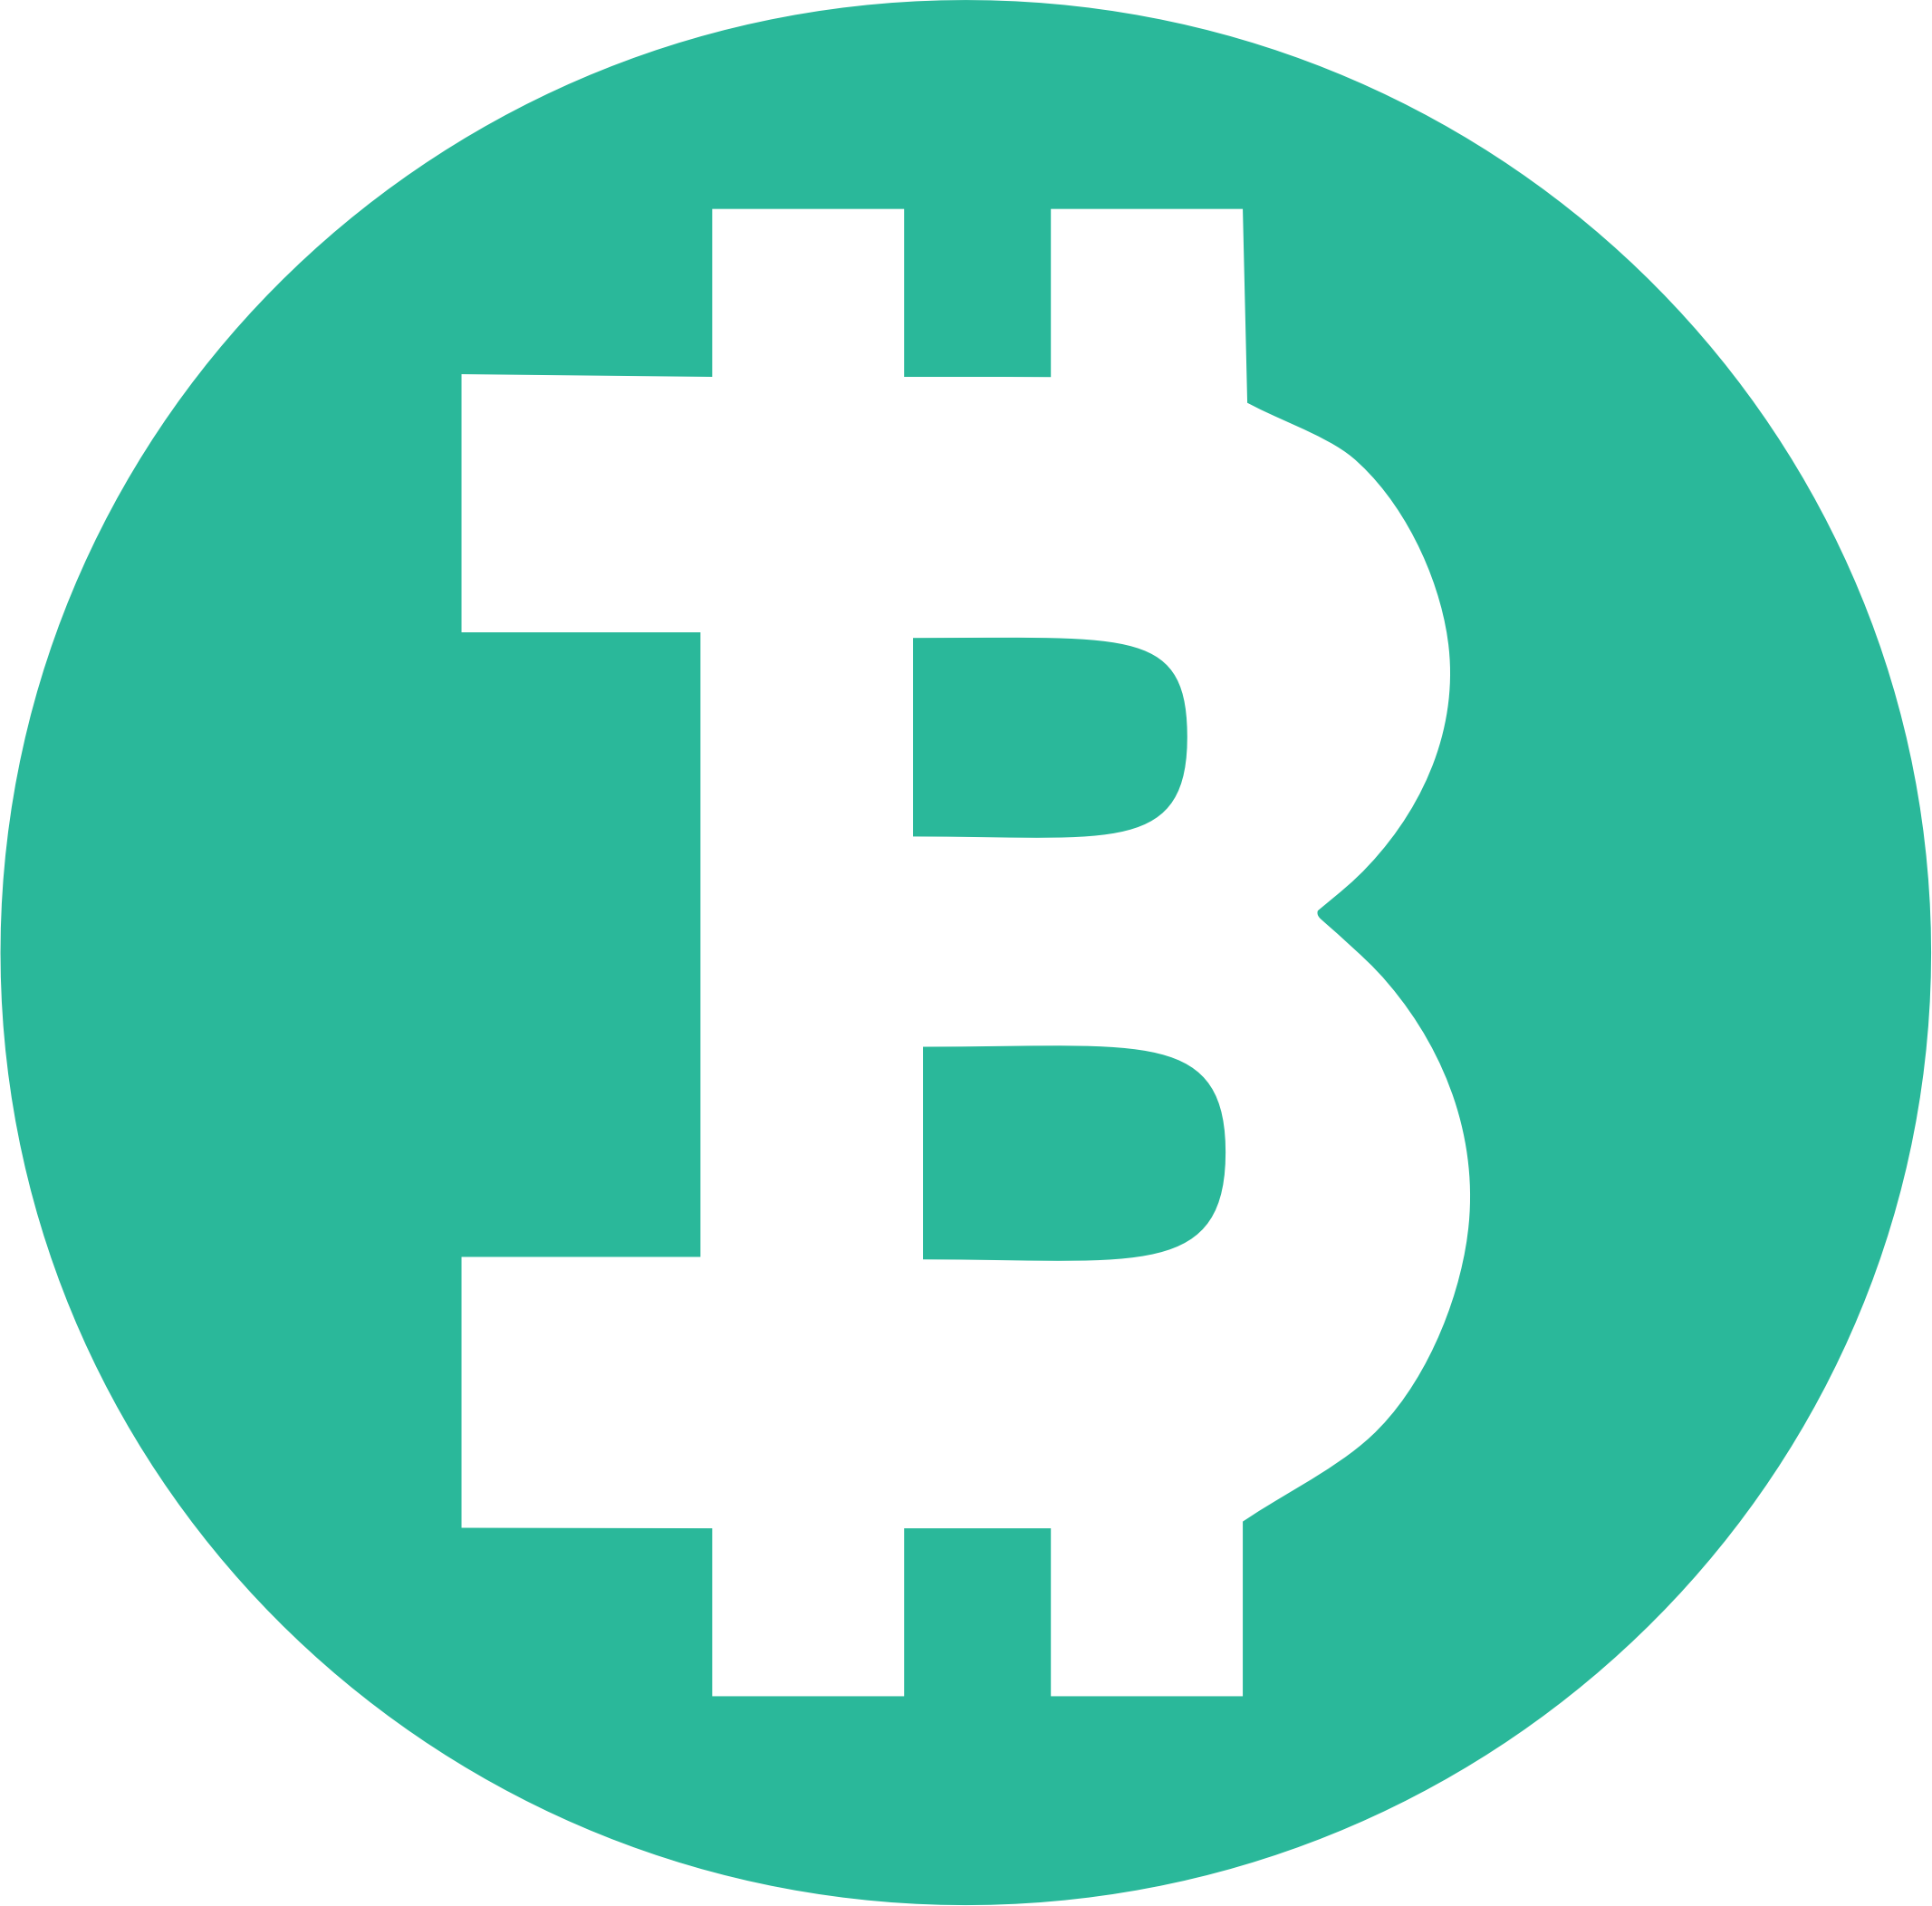 Coin clipart green. Bitcoin big image png